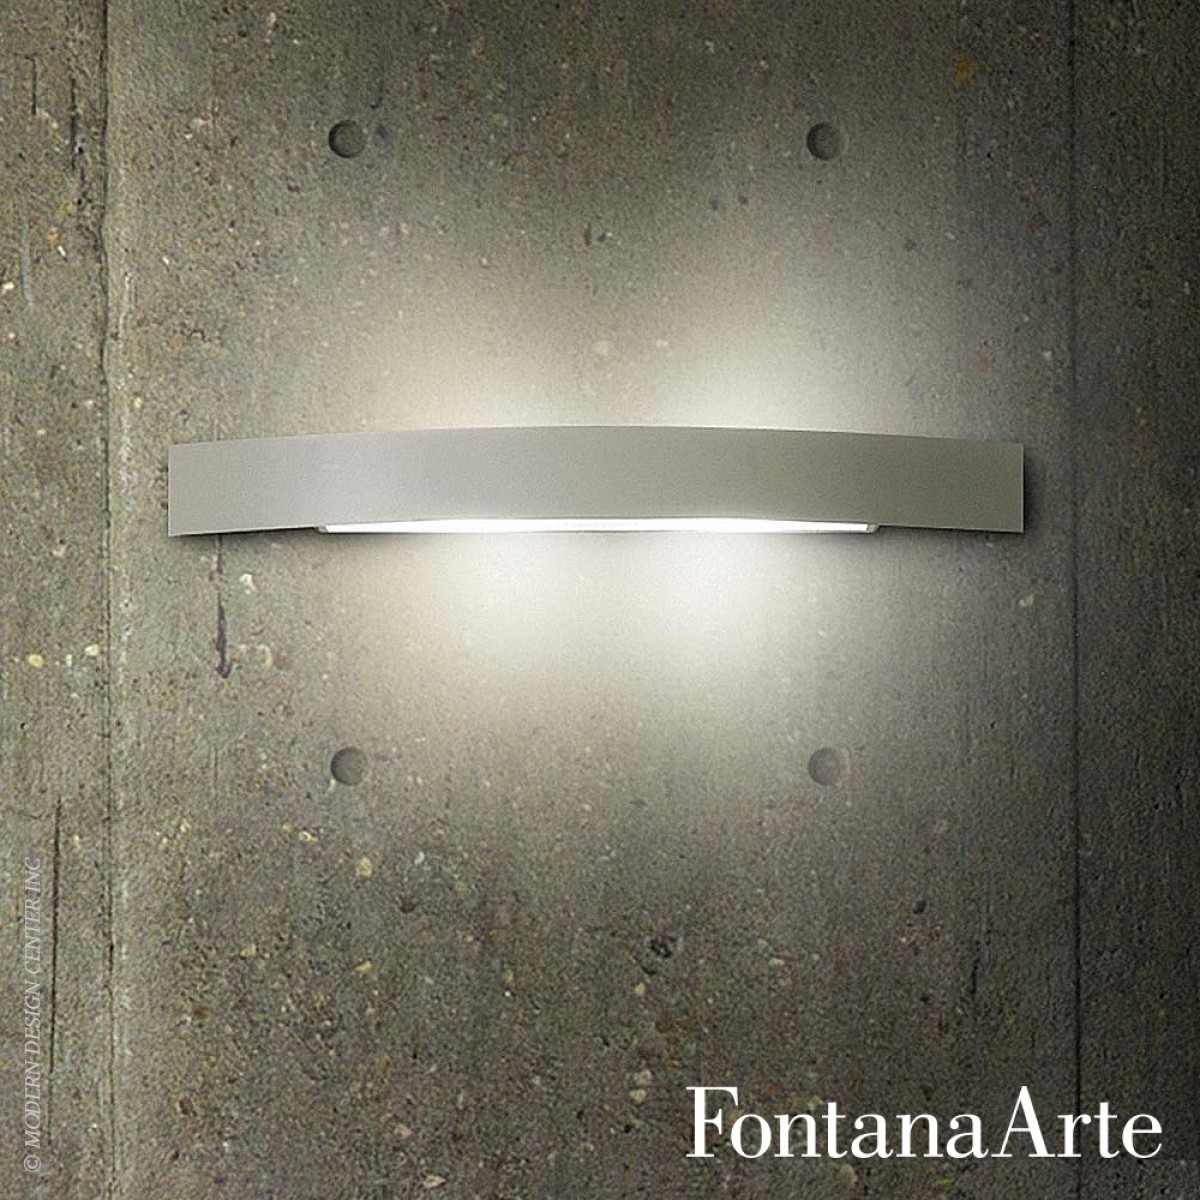 fontanaarte riga 36 inox wall lamp outletForFontana Arte Riga